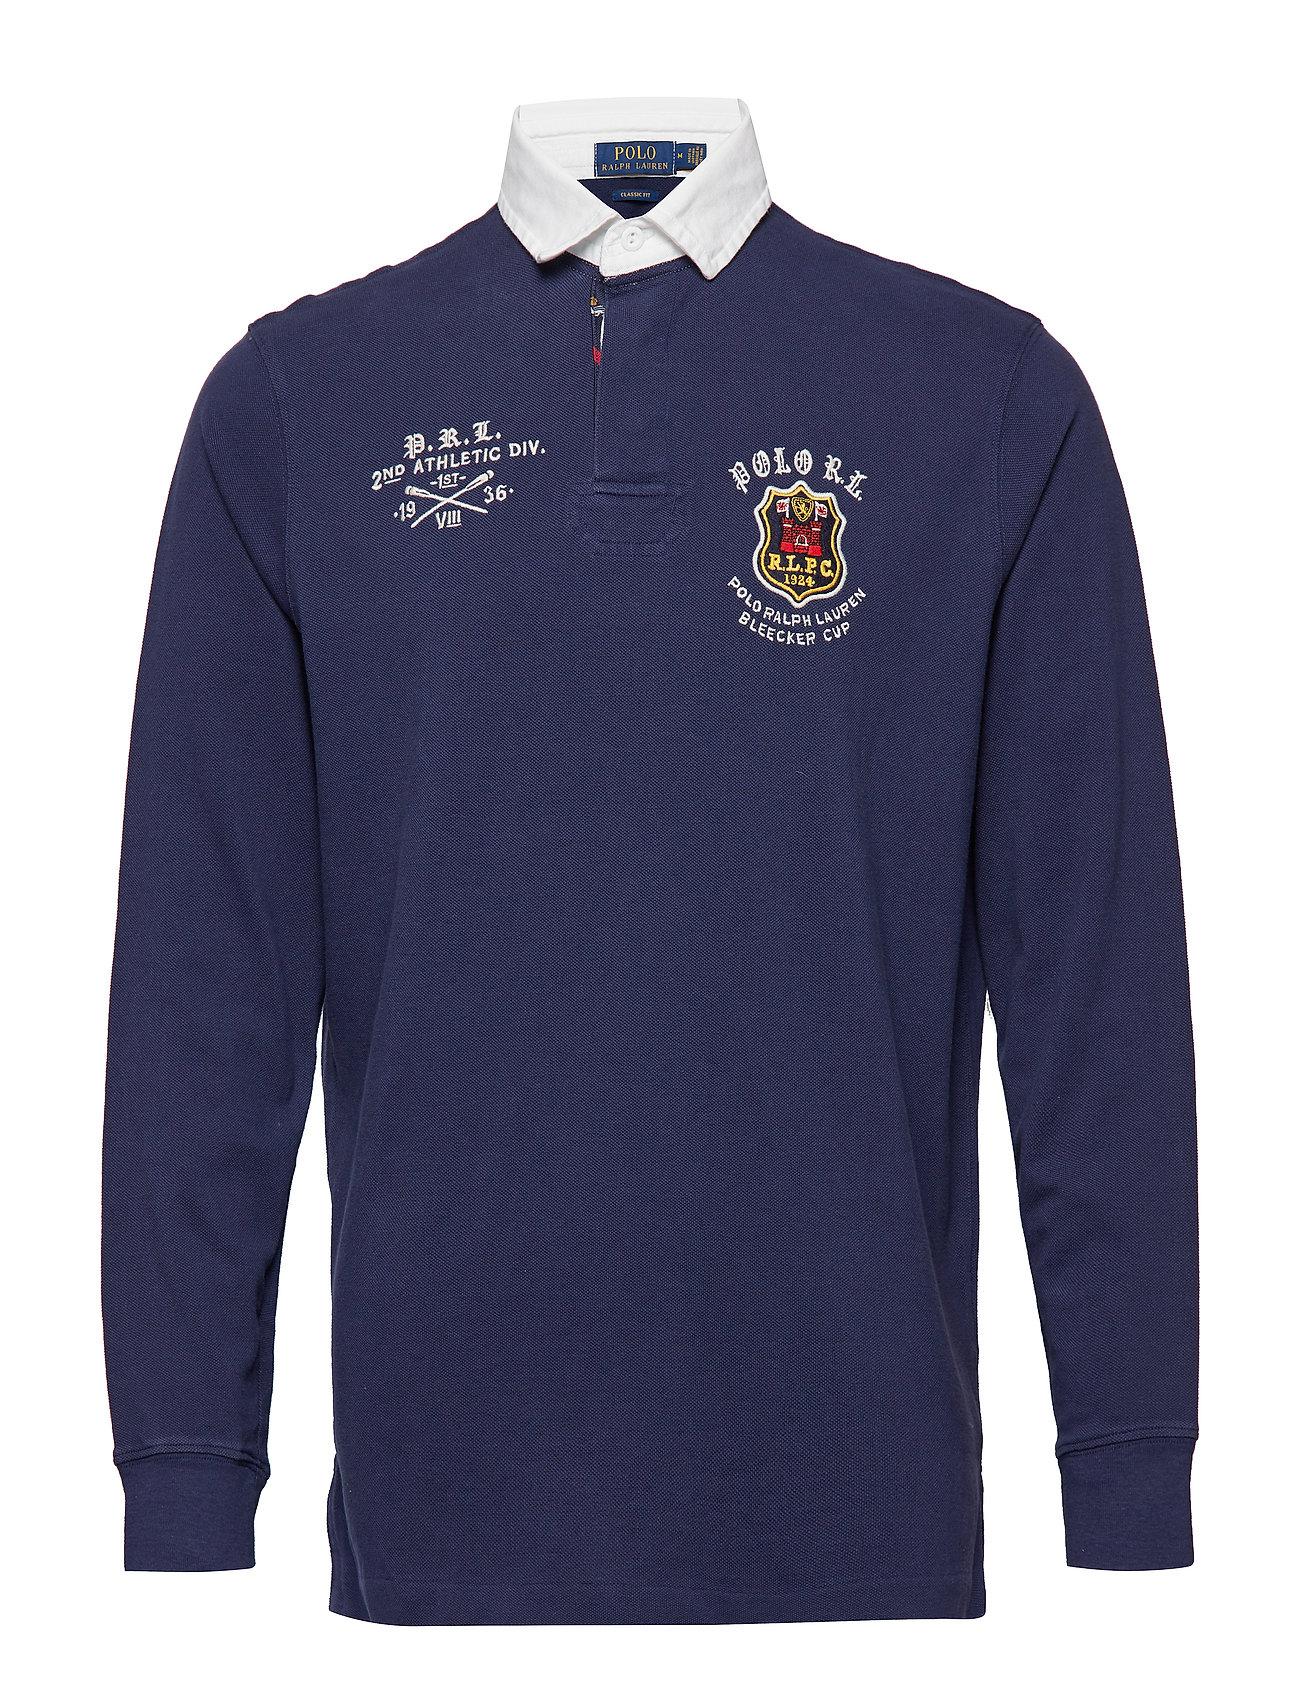 Lauren Classic Rugby Shirtnewport Ralph NavyPolo Fit Mesh QerdCoWBx